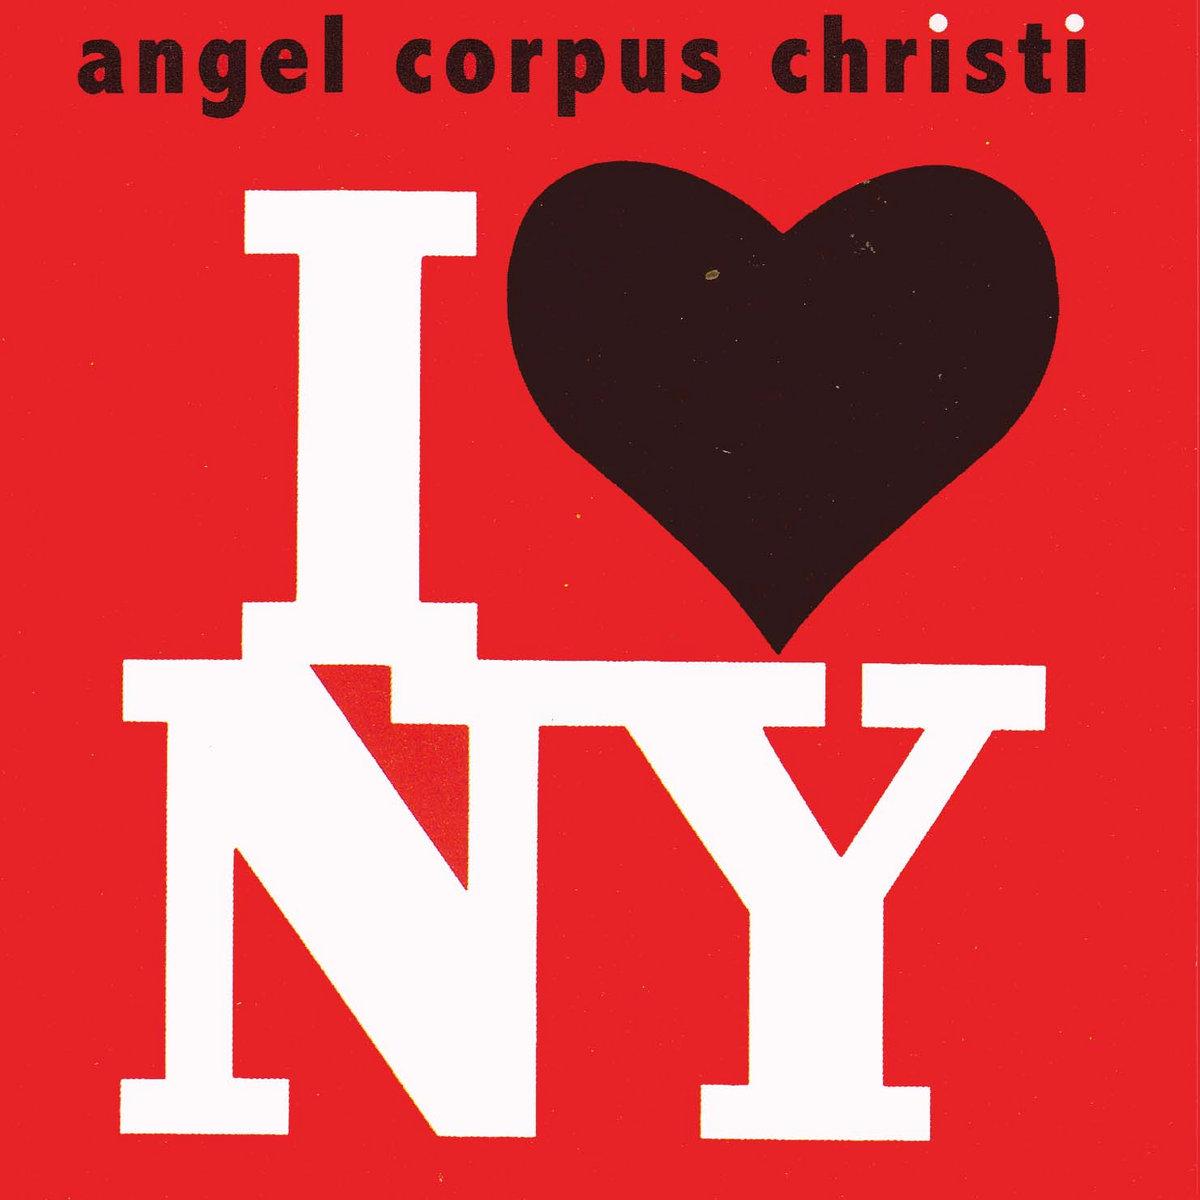 I Love New York Angel Corpus Christi